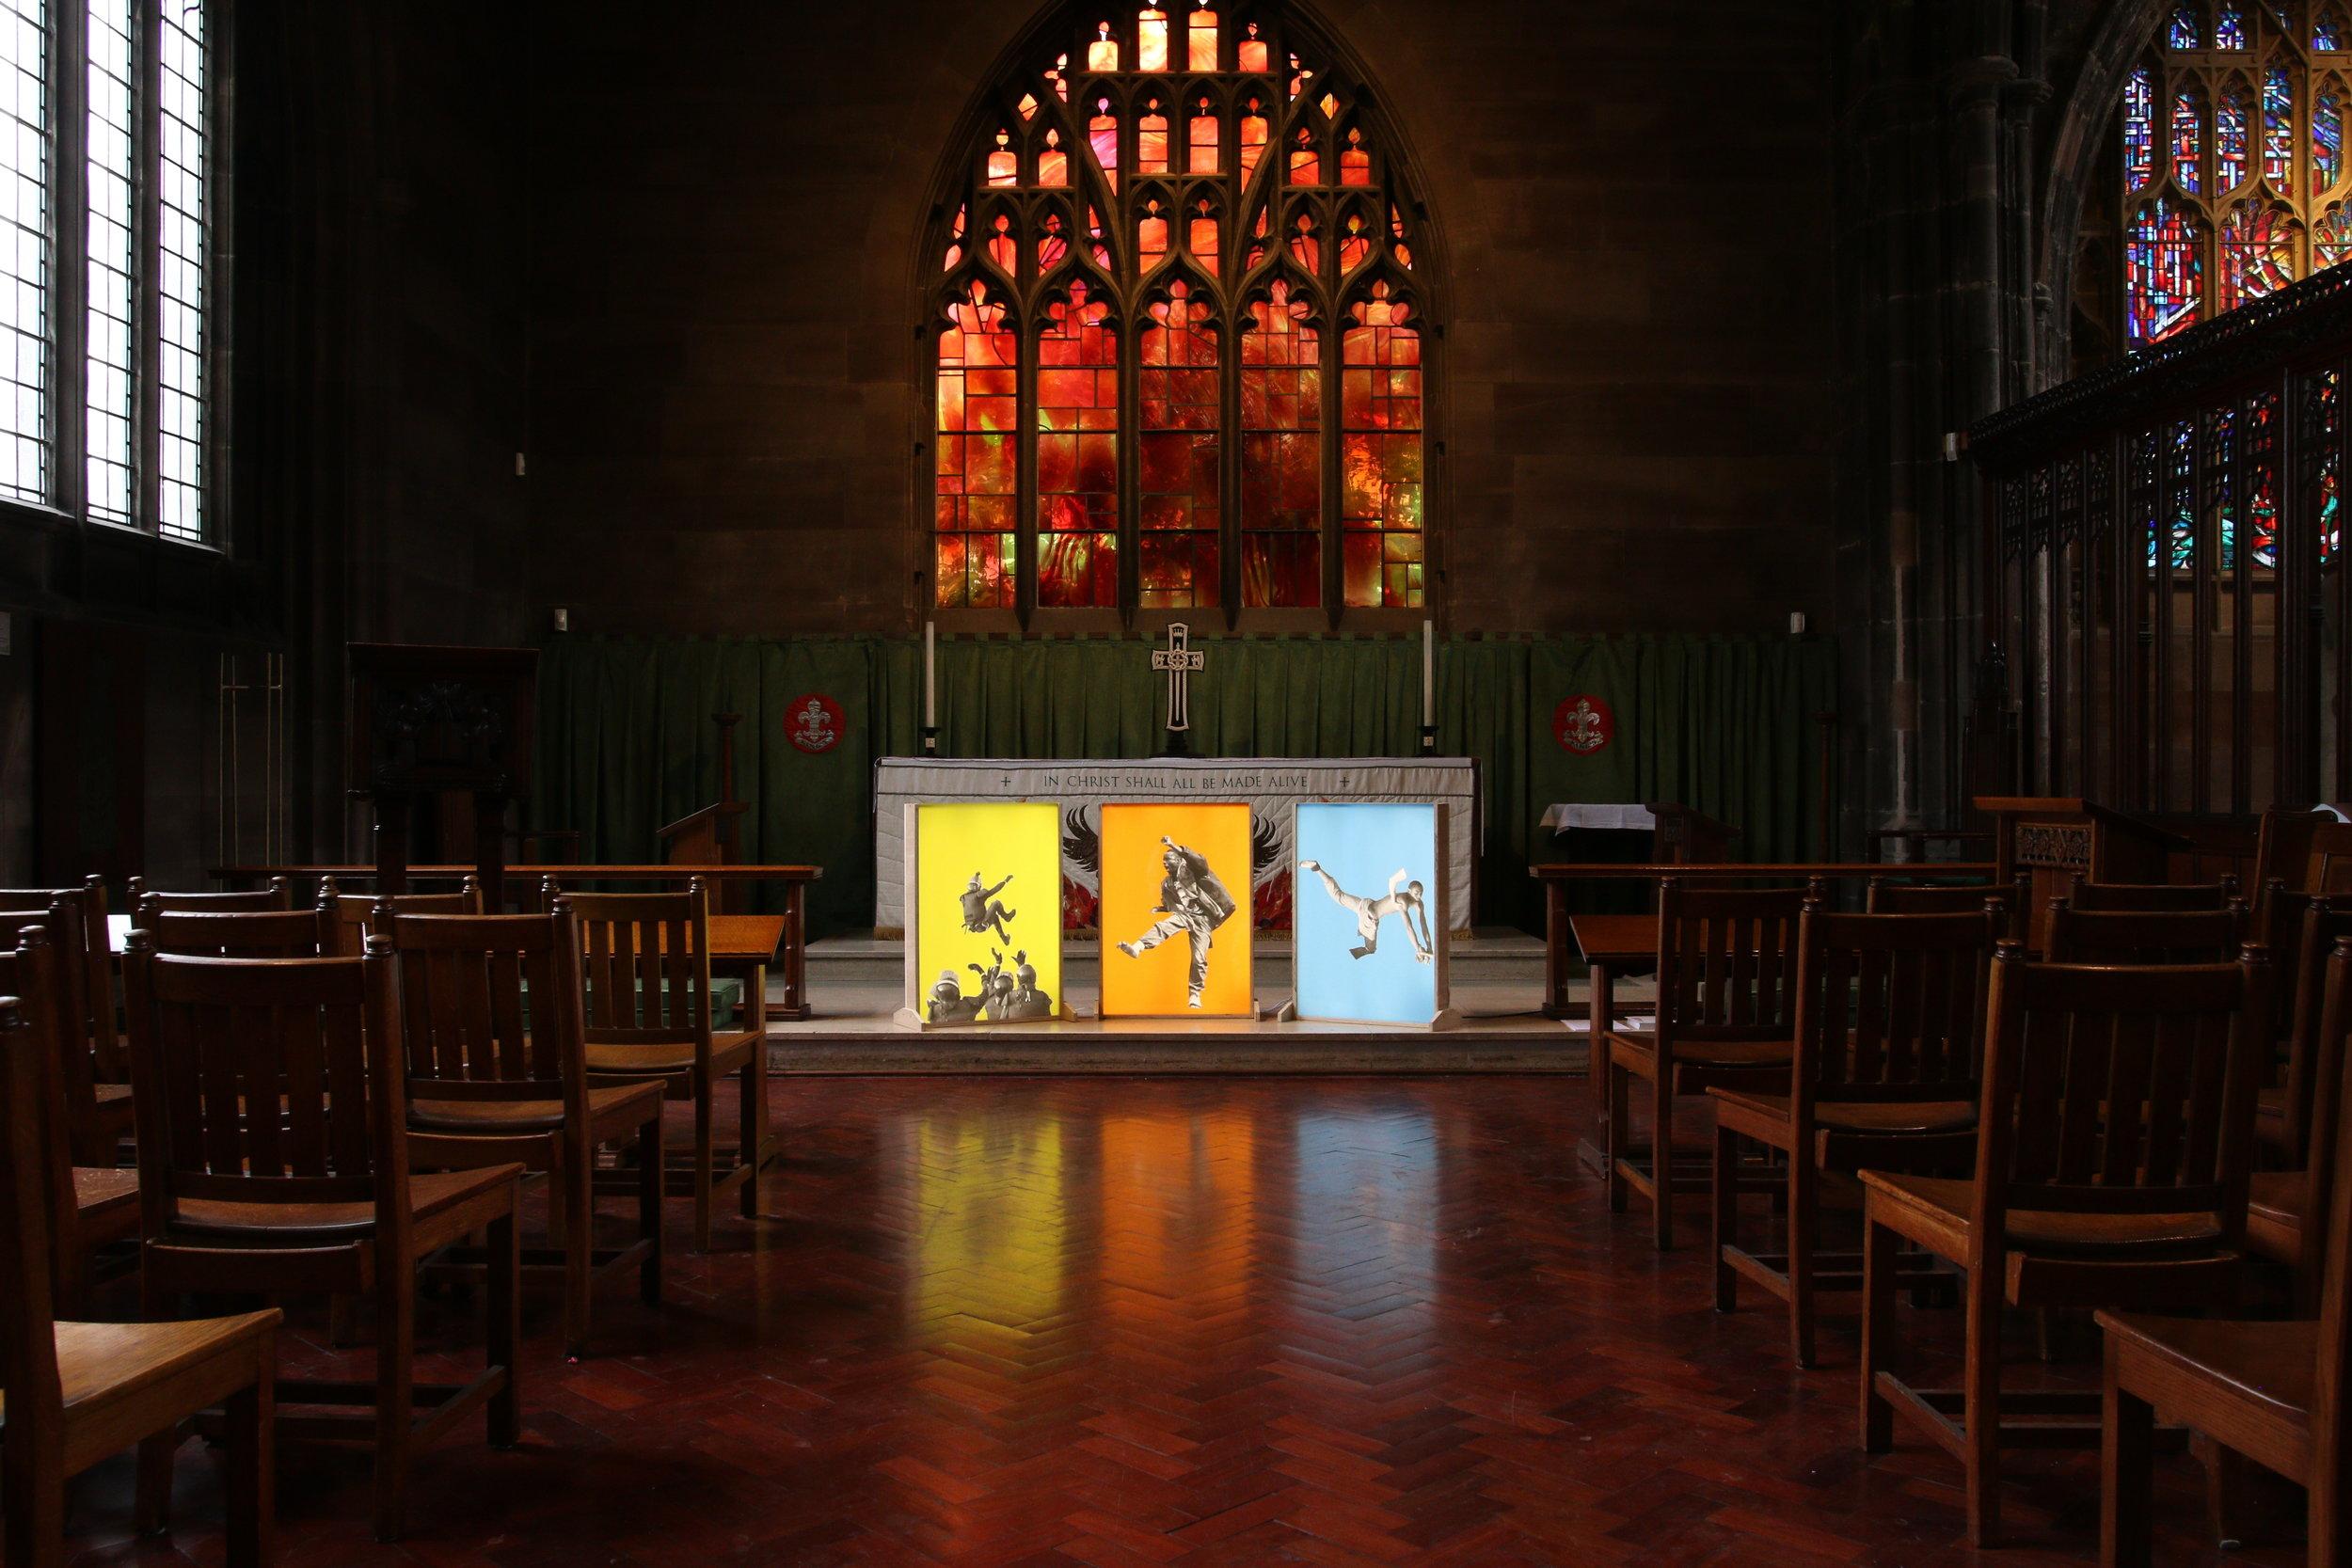 Elizabeth Kwant_ Habeas corpus_ Light box installation_ Manchester Cathedral_20194.JPG